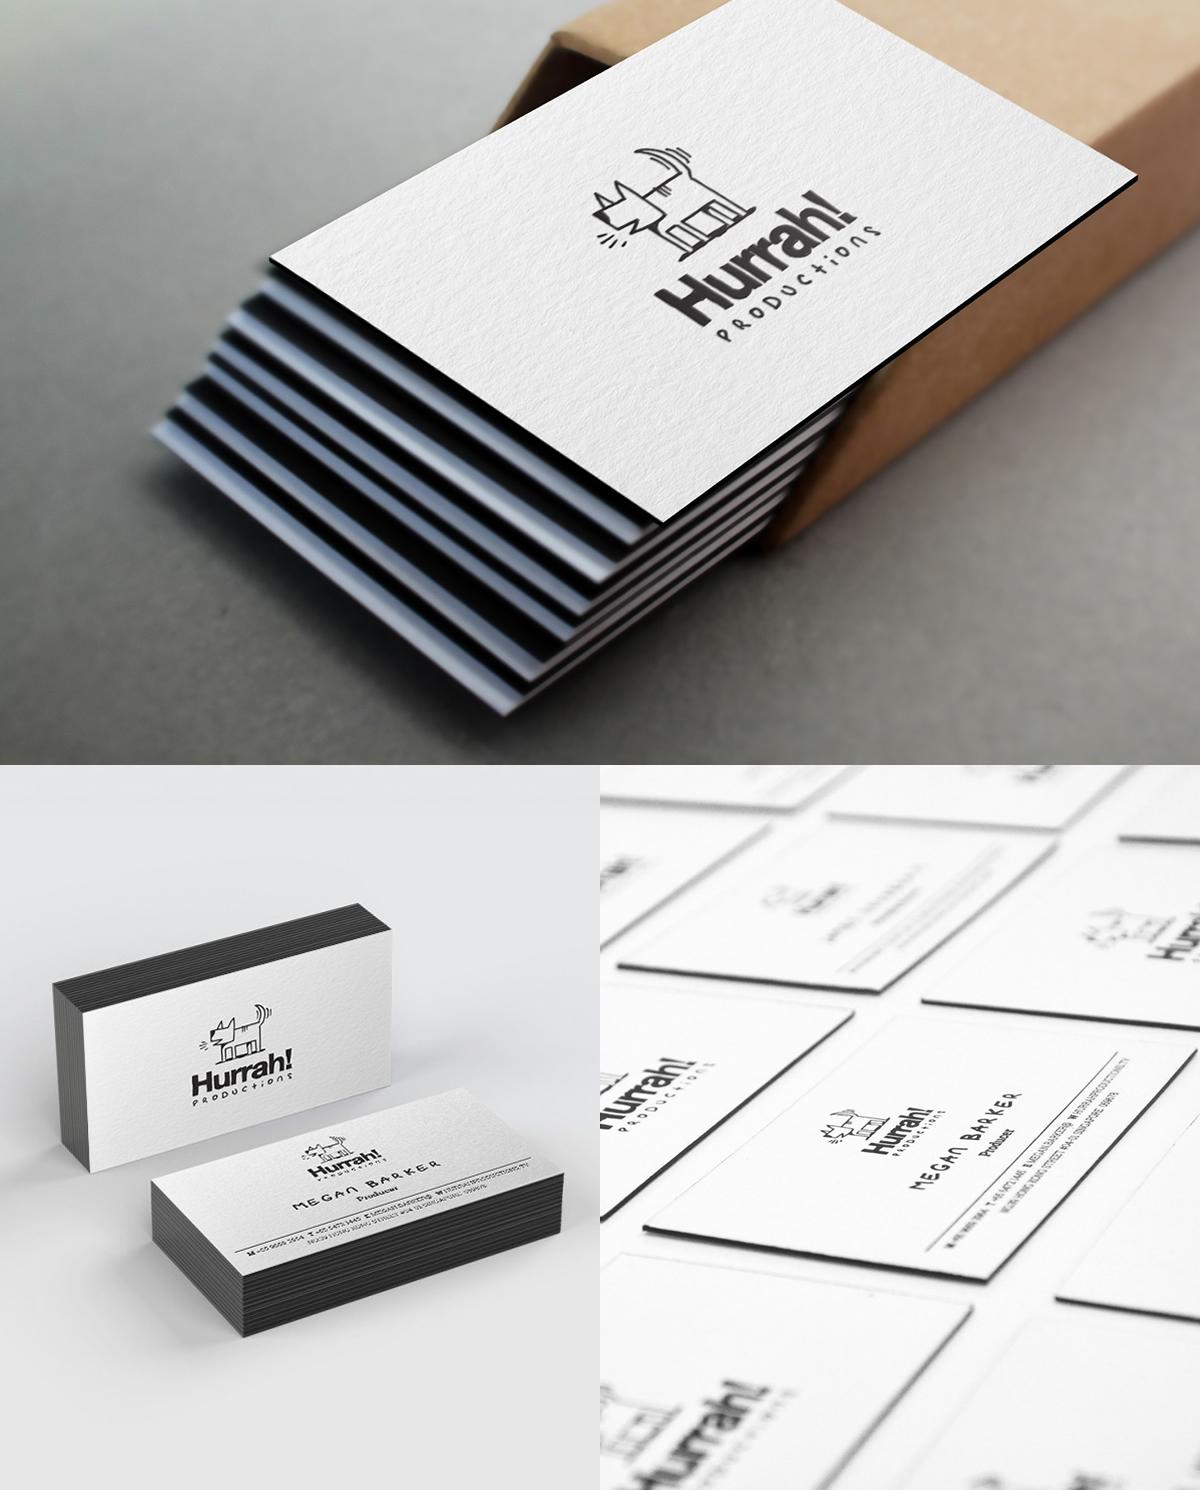 businesscard letterpress cotton materal hurrah! hurrah Production singapore black blackcard blackedgecard blackedge premium namecard